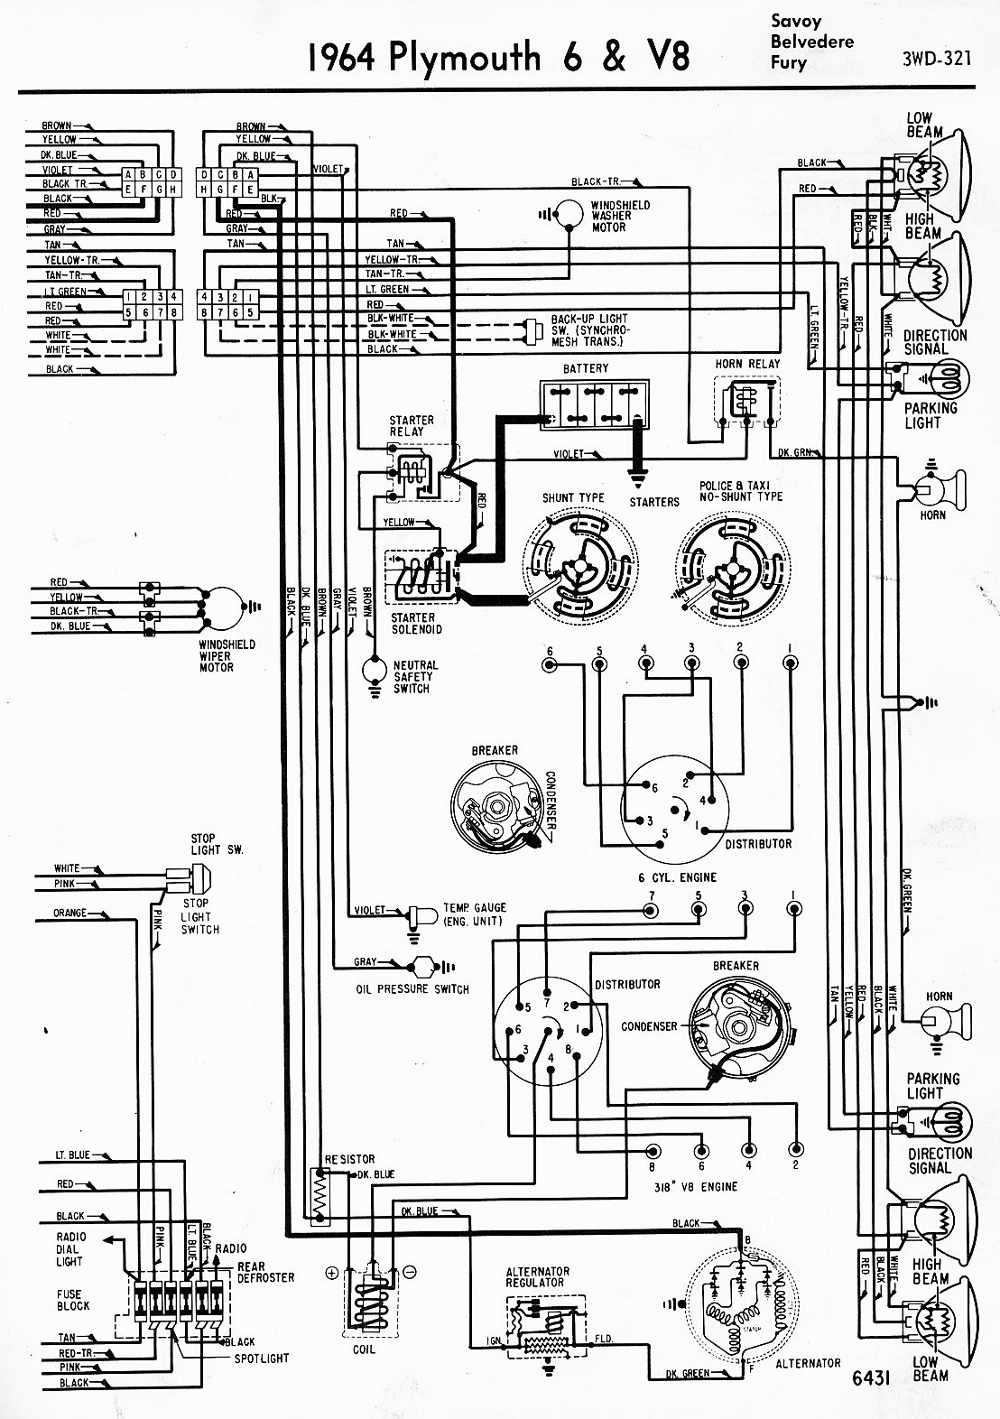 66 Chevelle Wiring Diagram Pdf 66 Circuit Diagrams